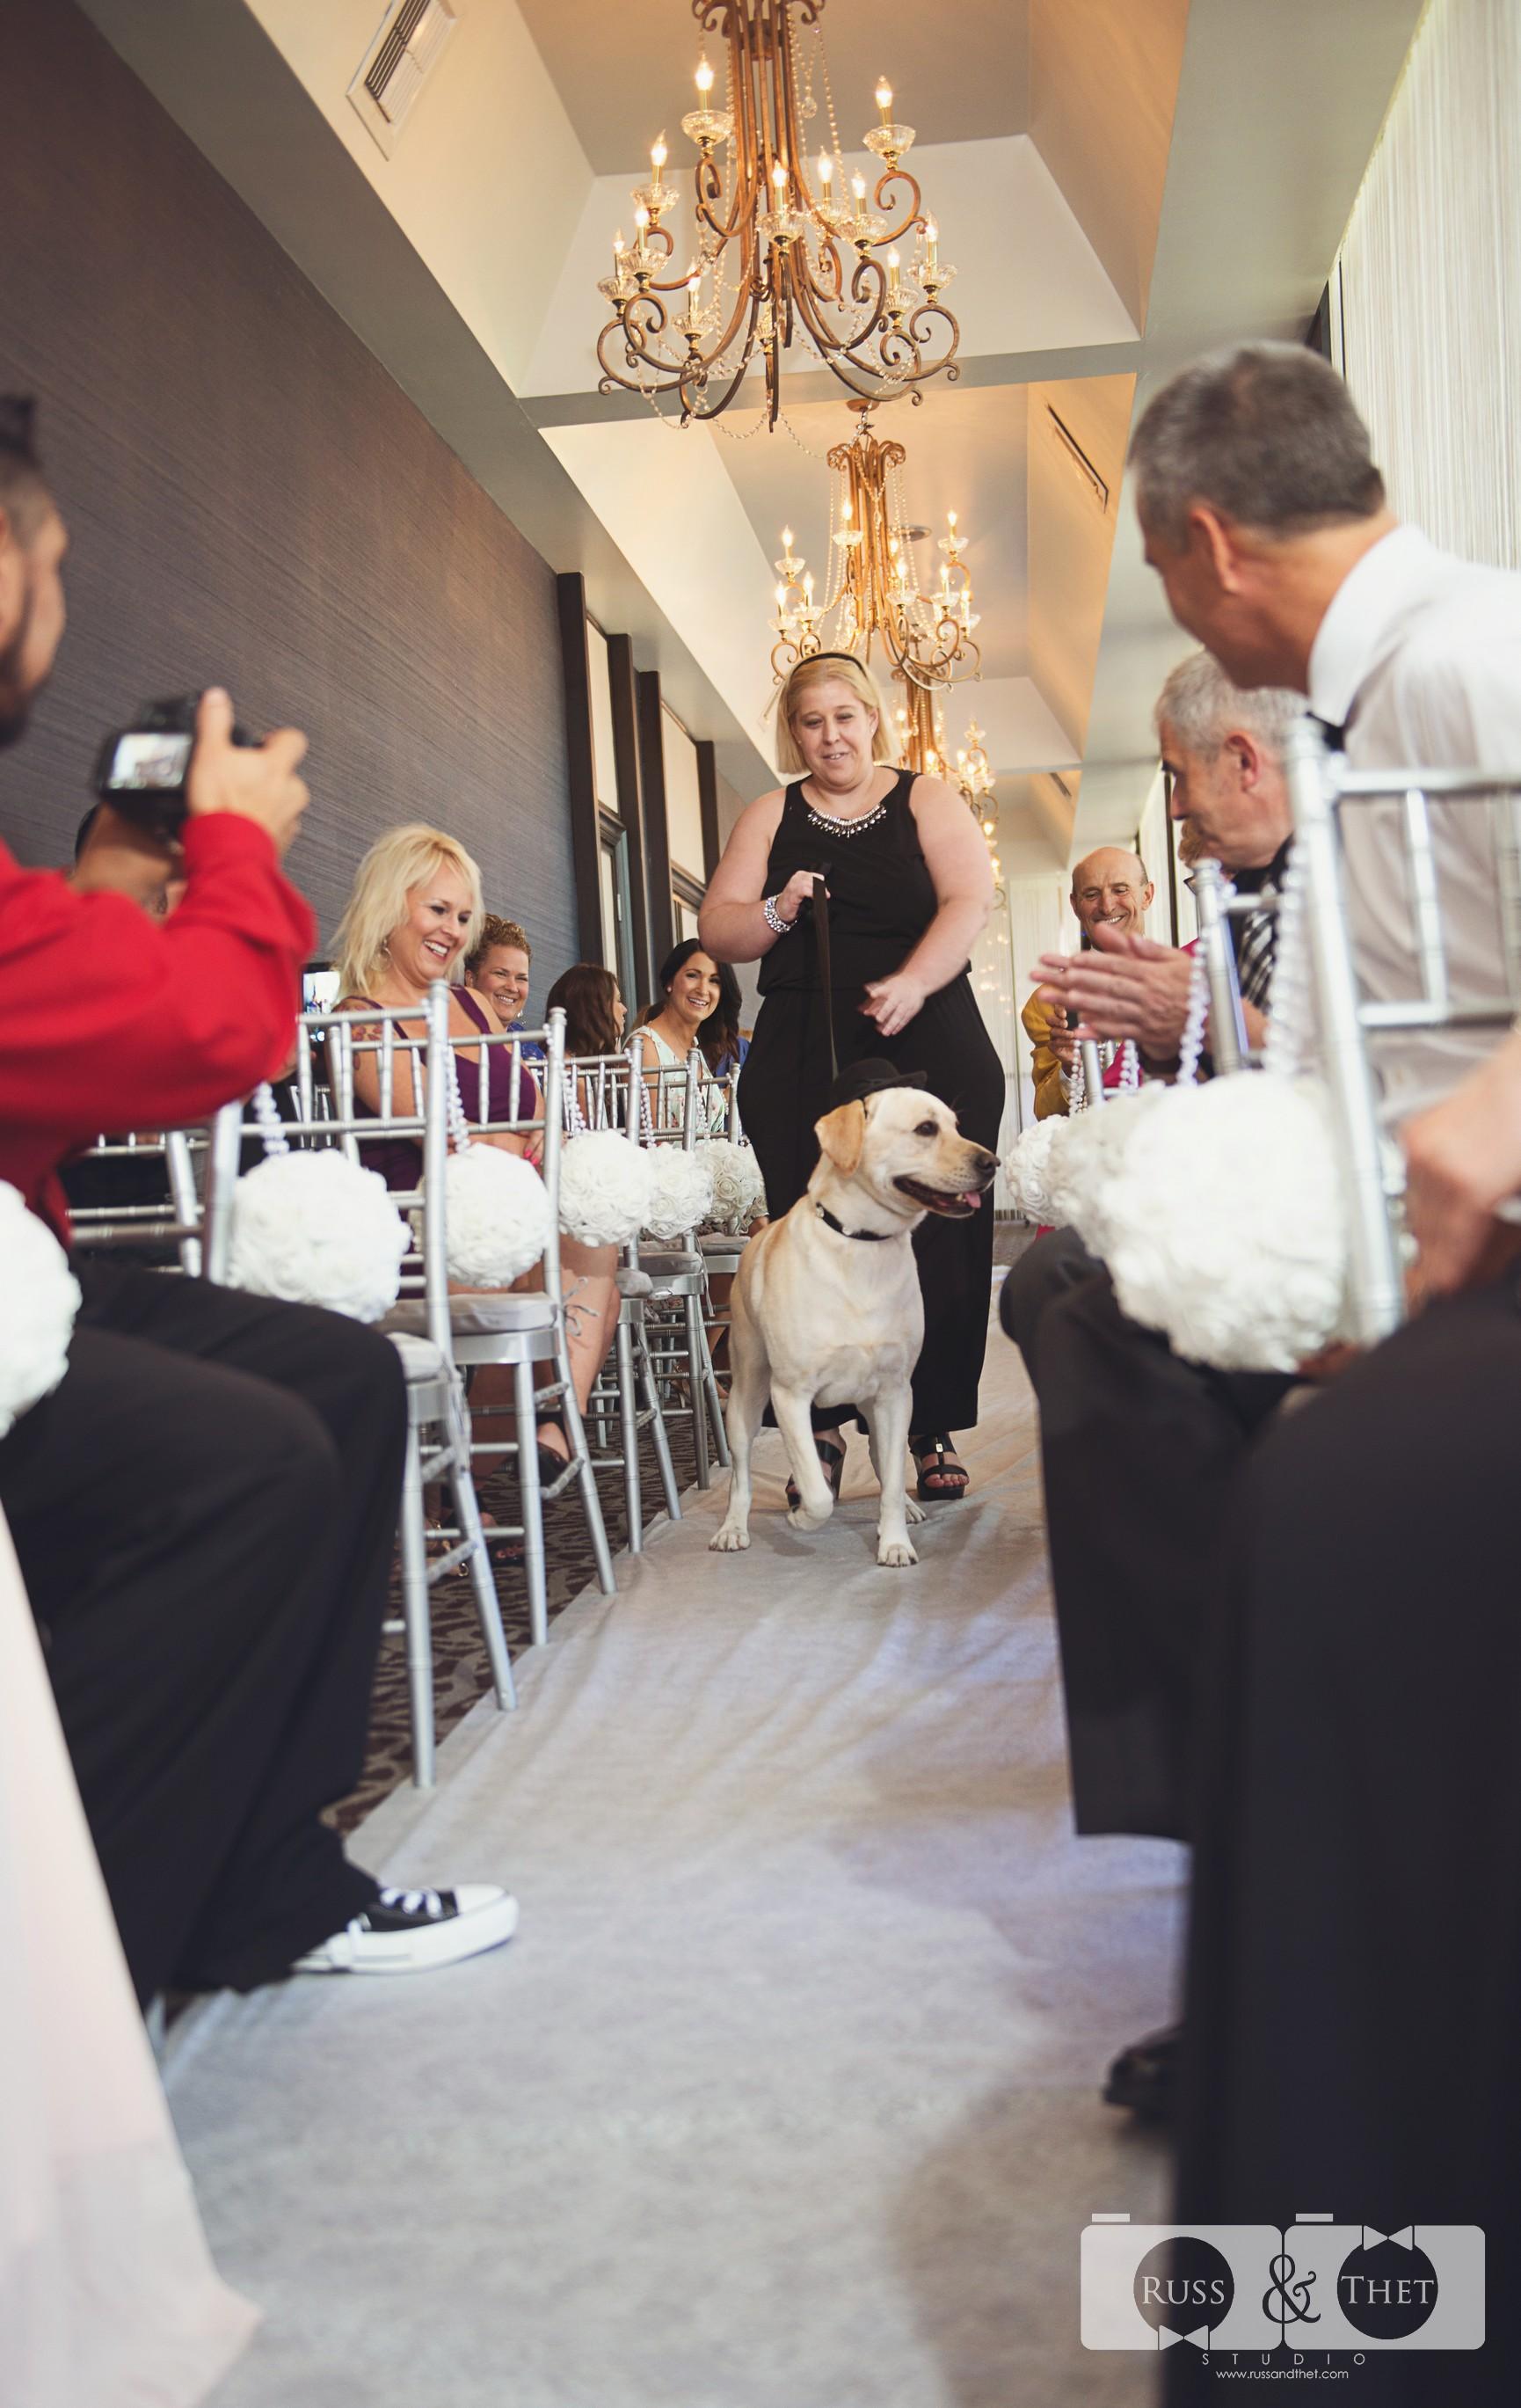 Jon&Kimee-The-Hills-Hotel-Wedding-Photographer (54).jpg